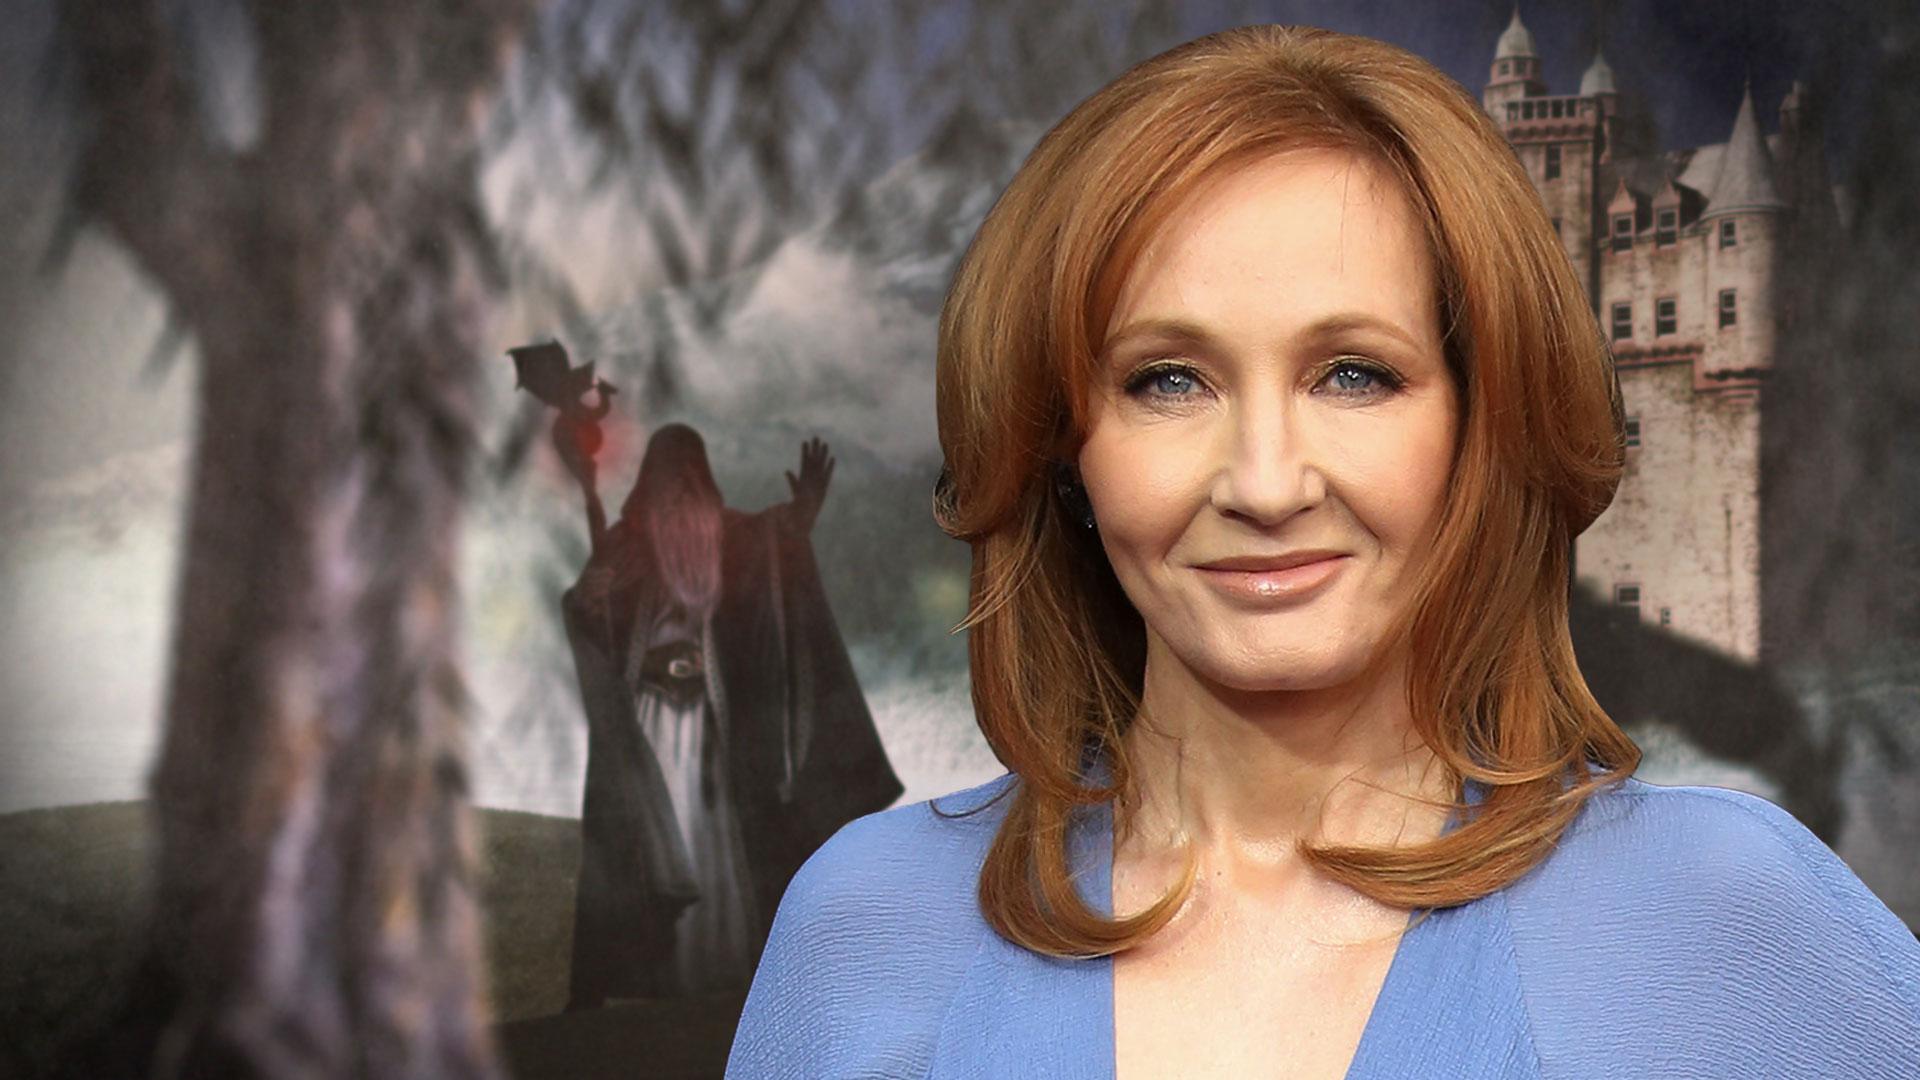 Biography: J. K. Rowling